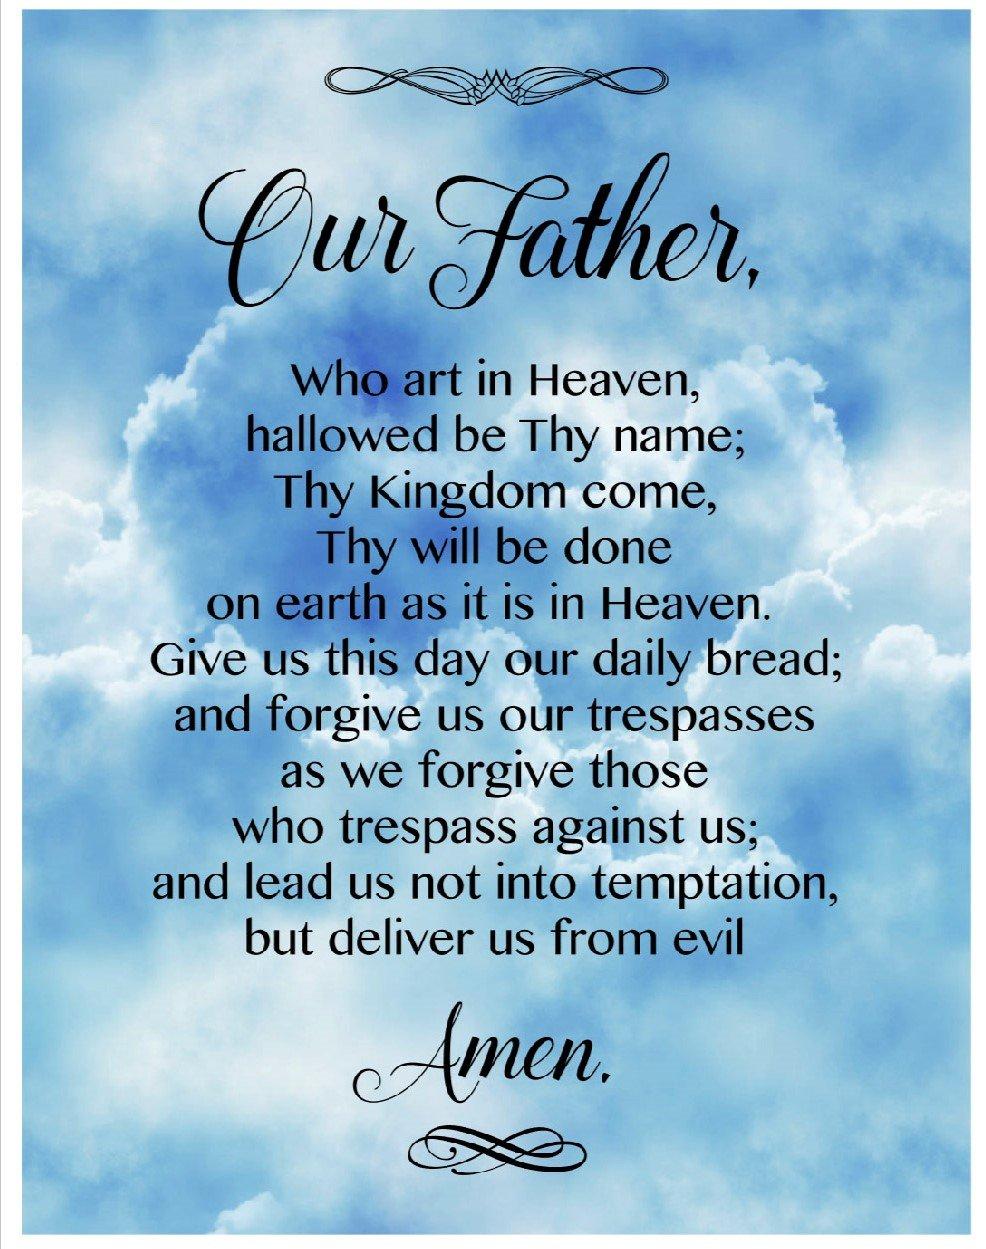 DT Lord's Prayer 44 x 36 Panel